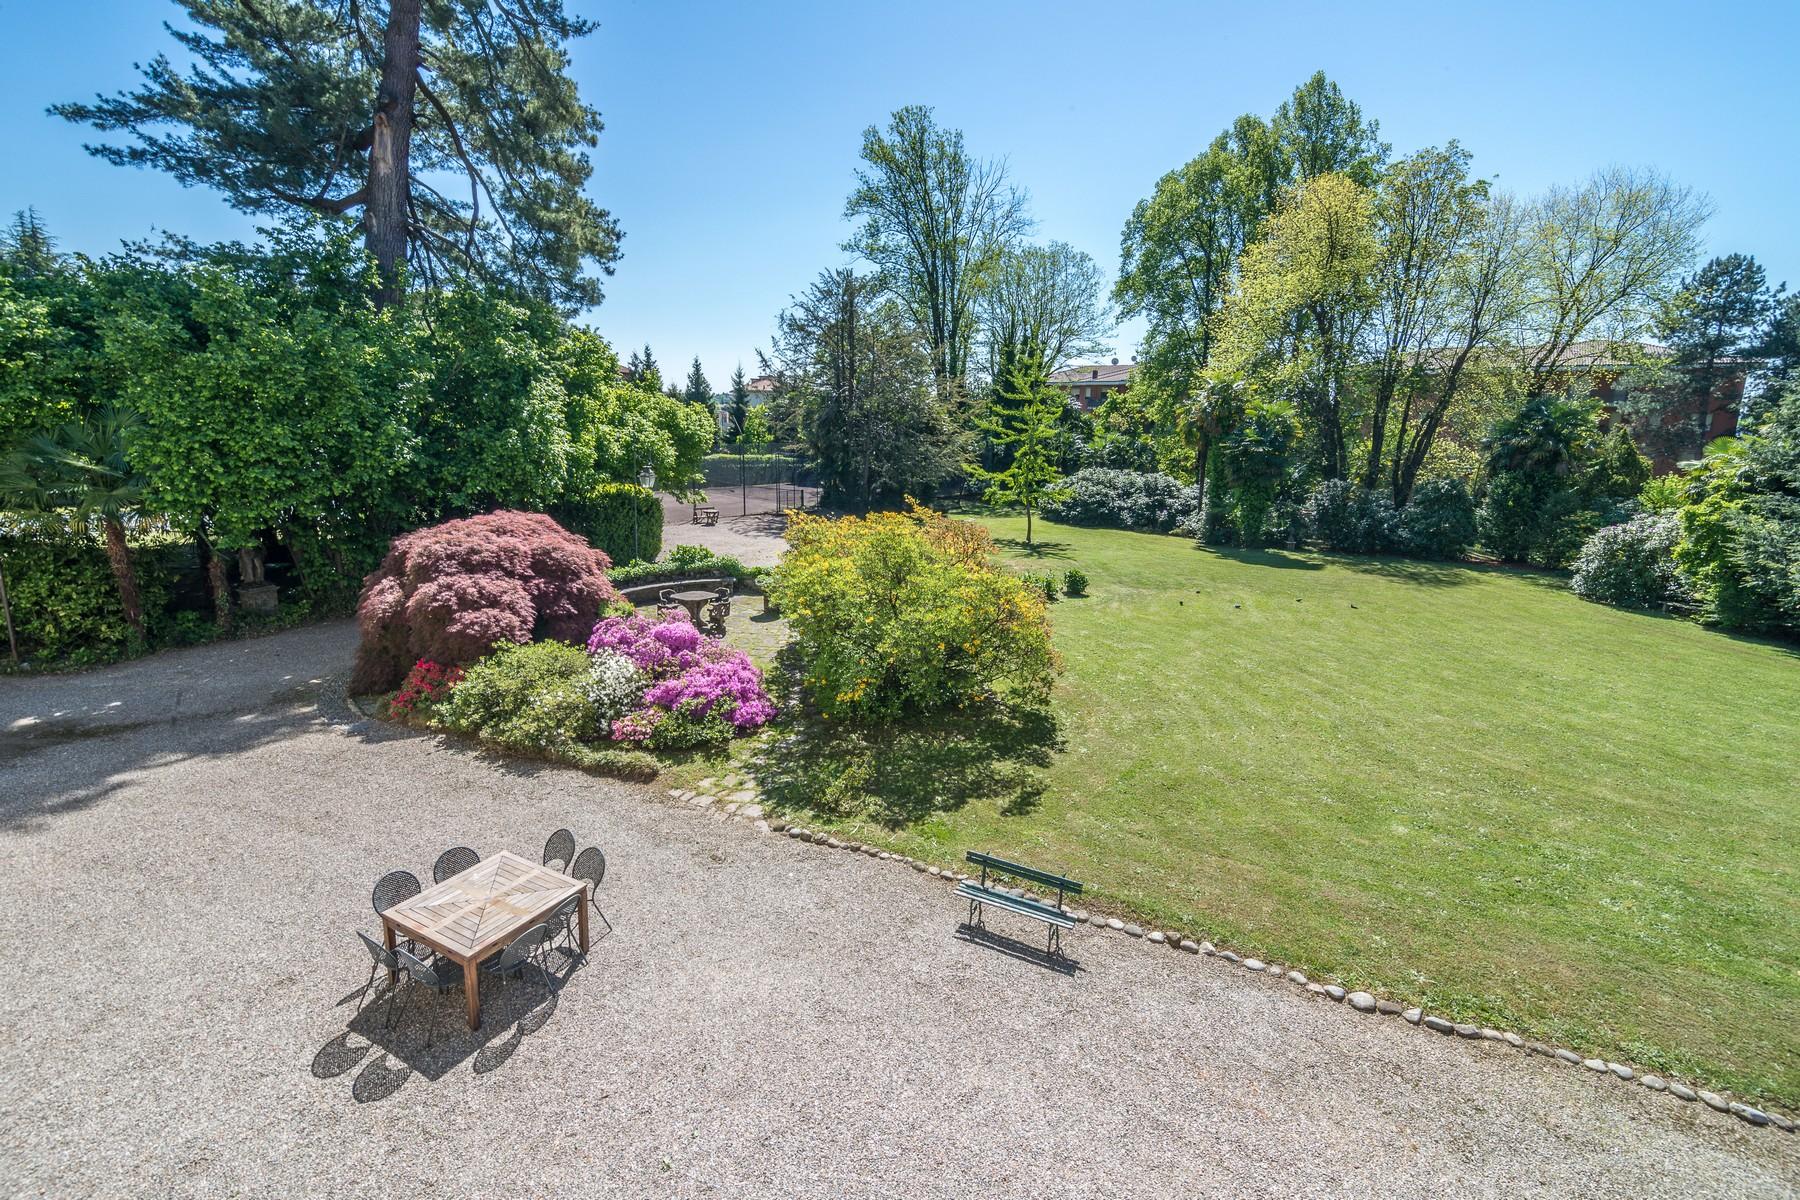 Villa in Vendita a Varese: 5 locali, 1500 mq - Foto 20